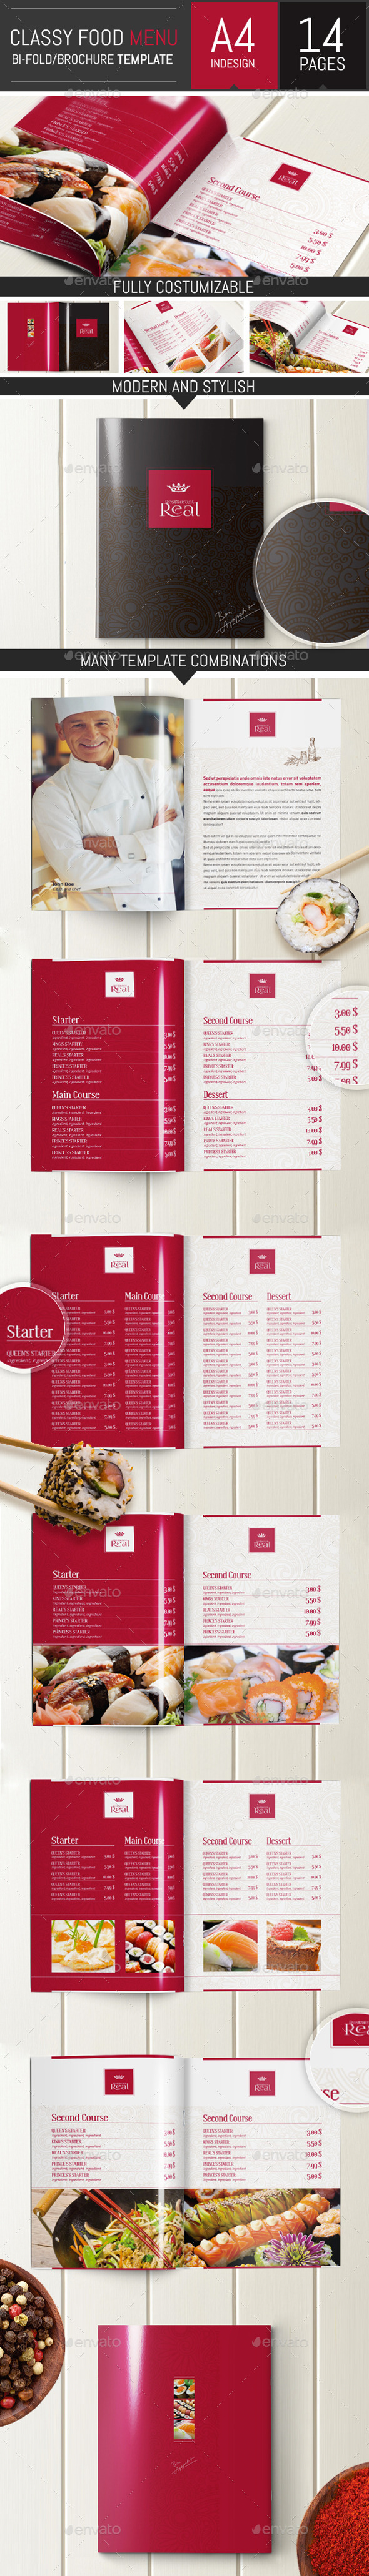 GraphicRiver Classy Food Menu Brochure Template 9315871